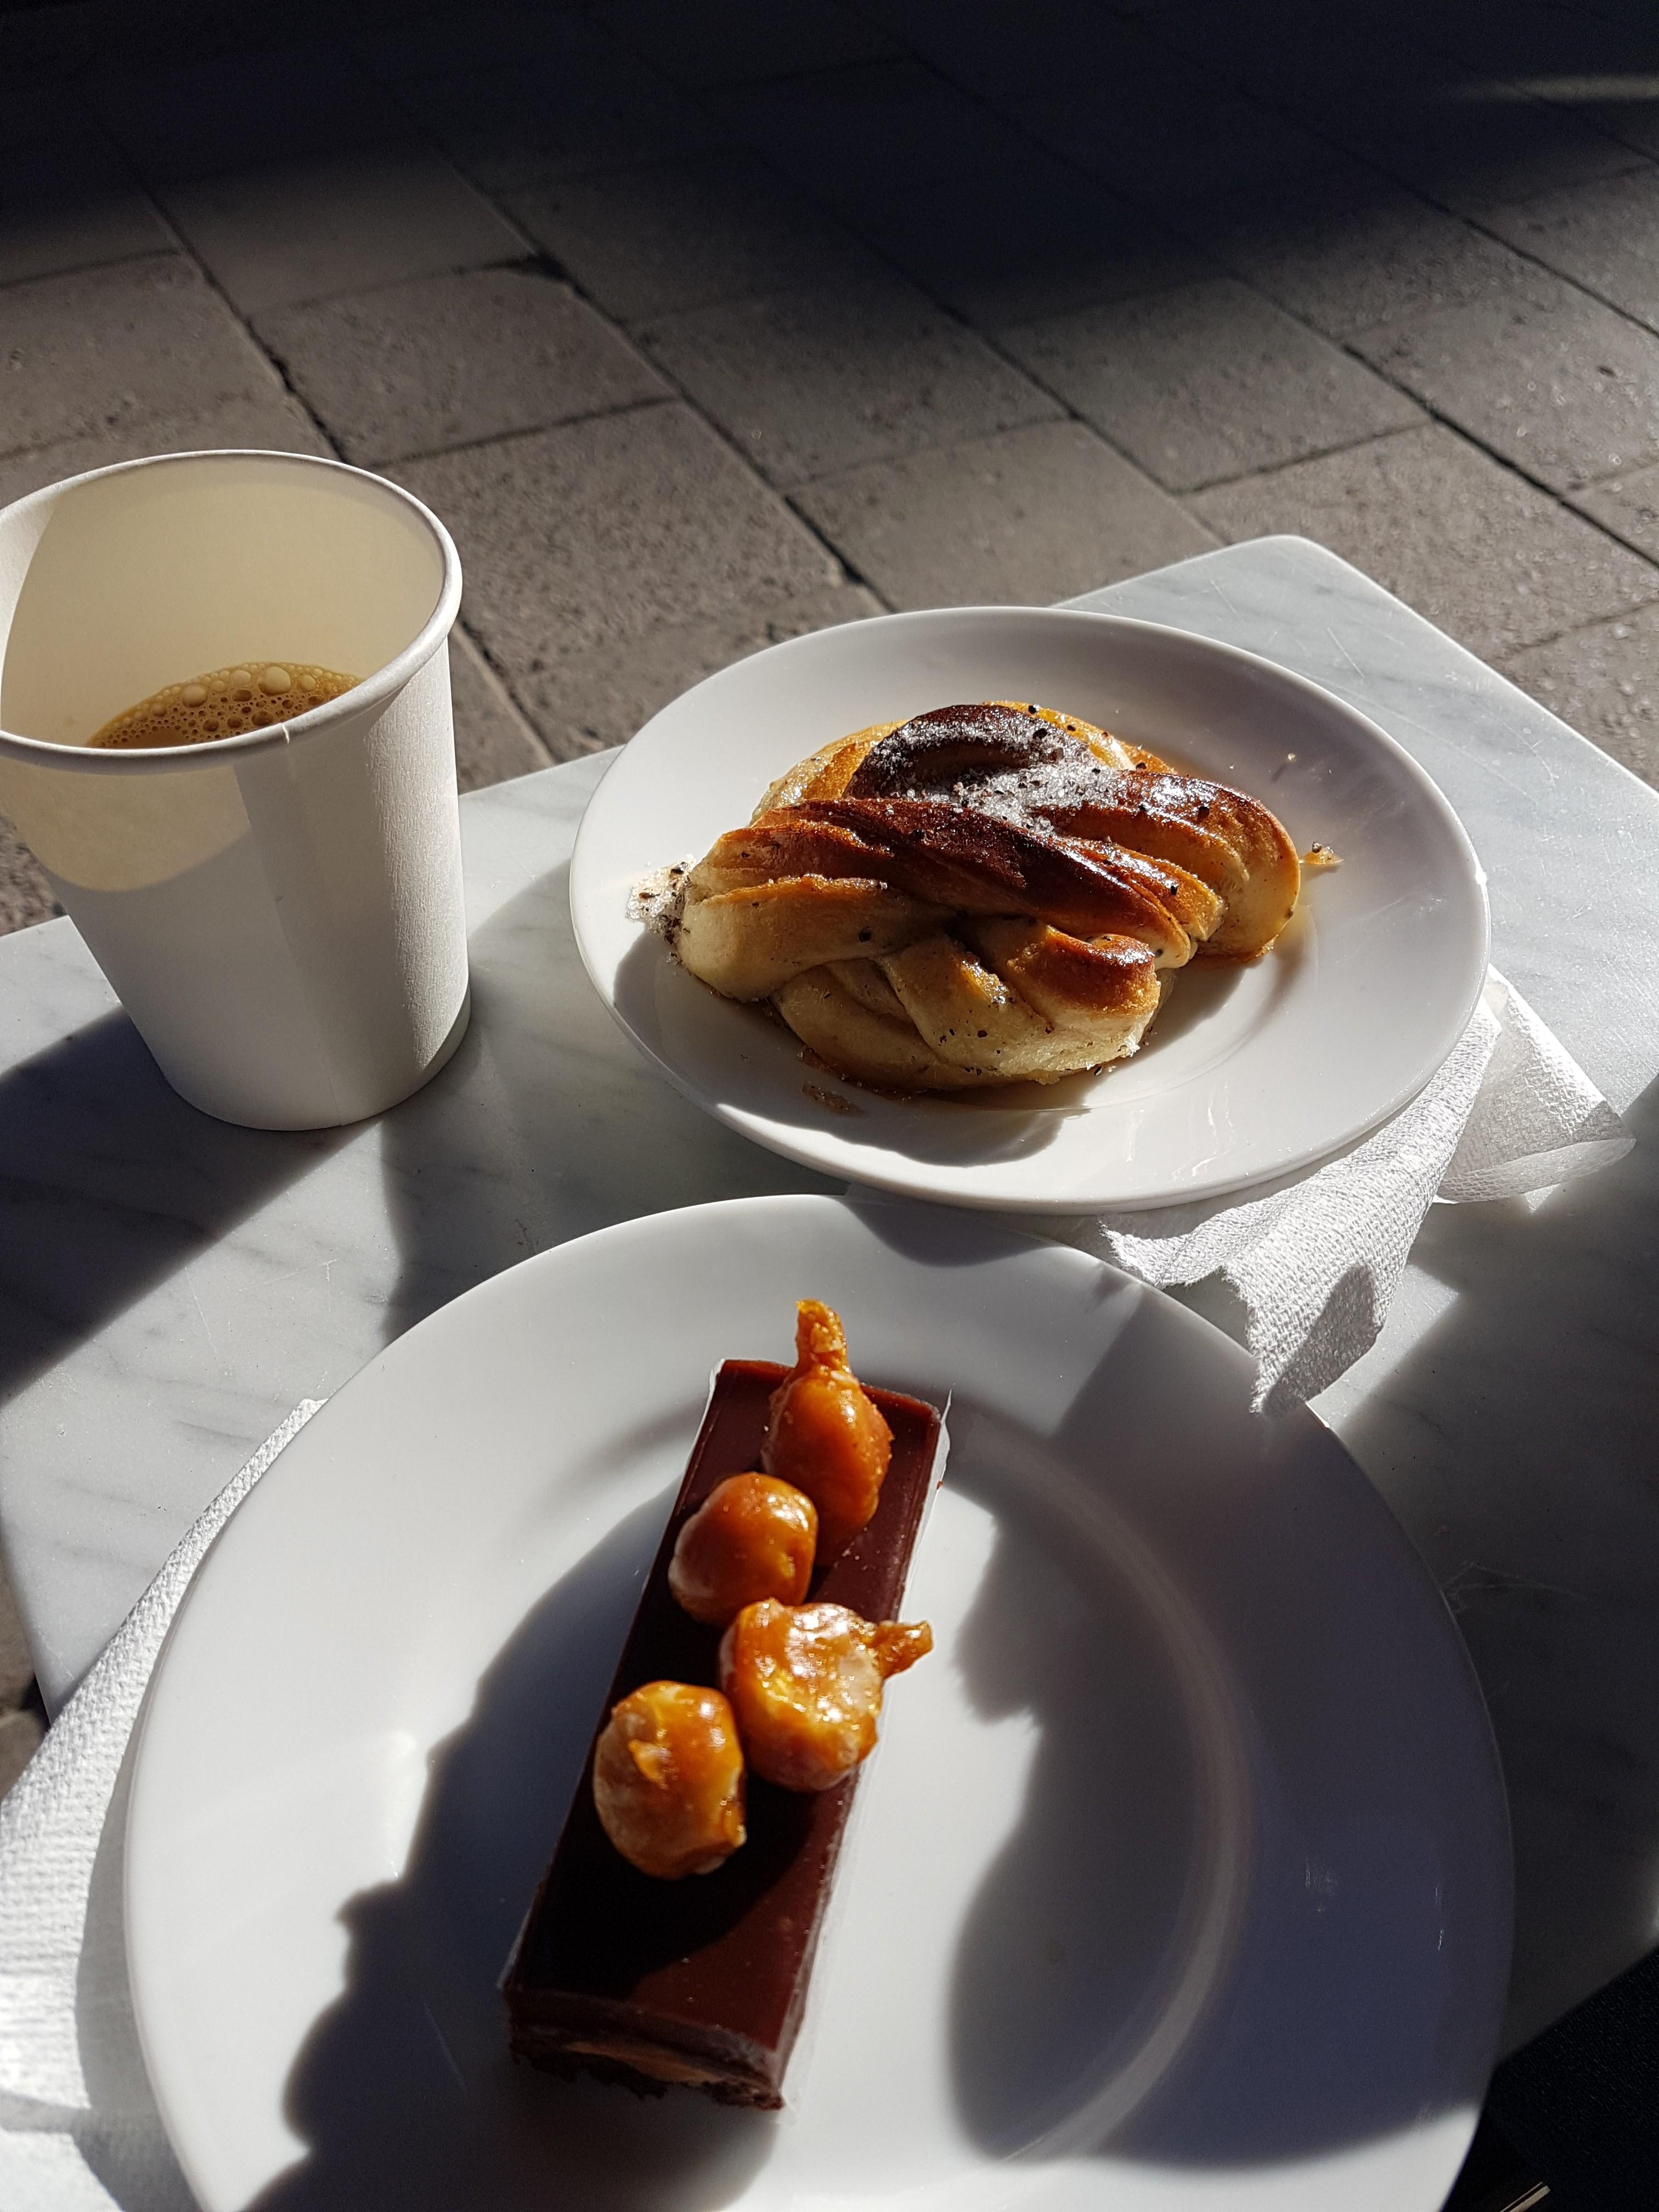 Kanelbullens Dag: the Swedish holiday all about cinnamon buns